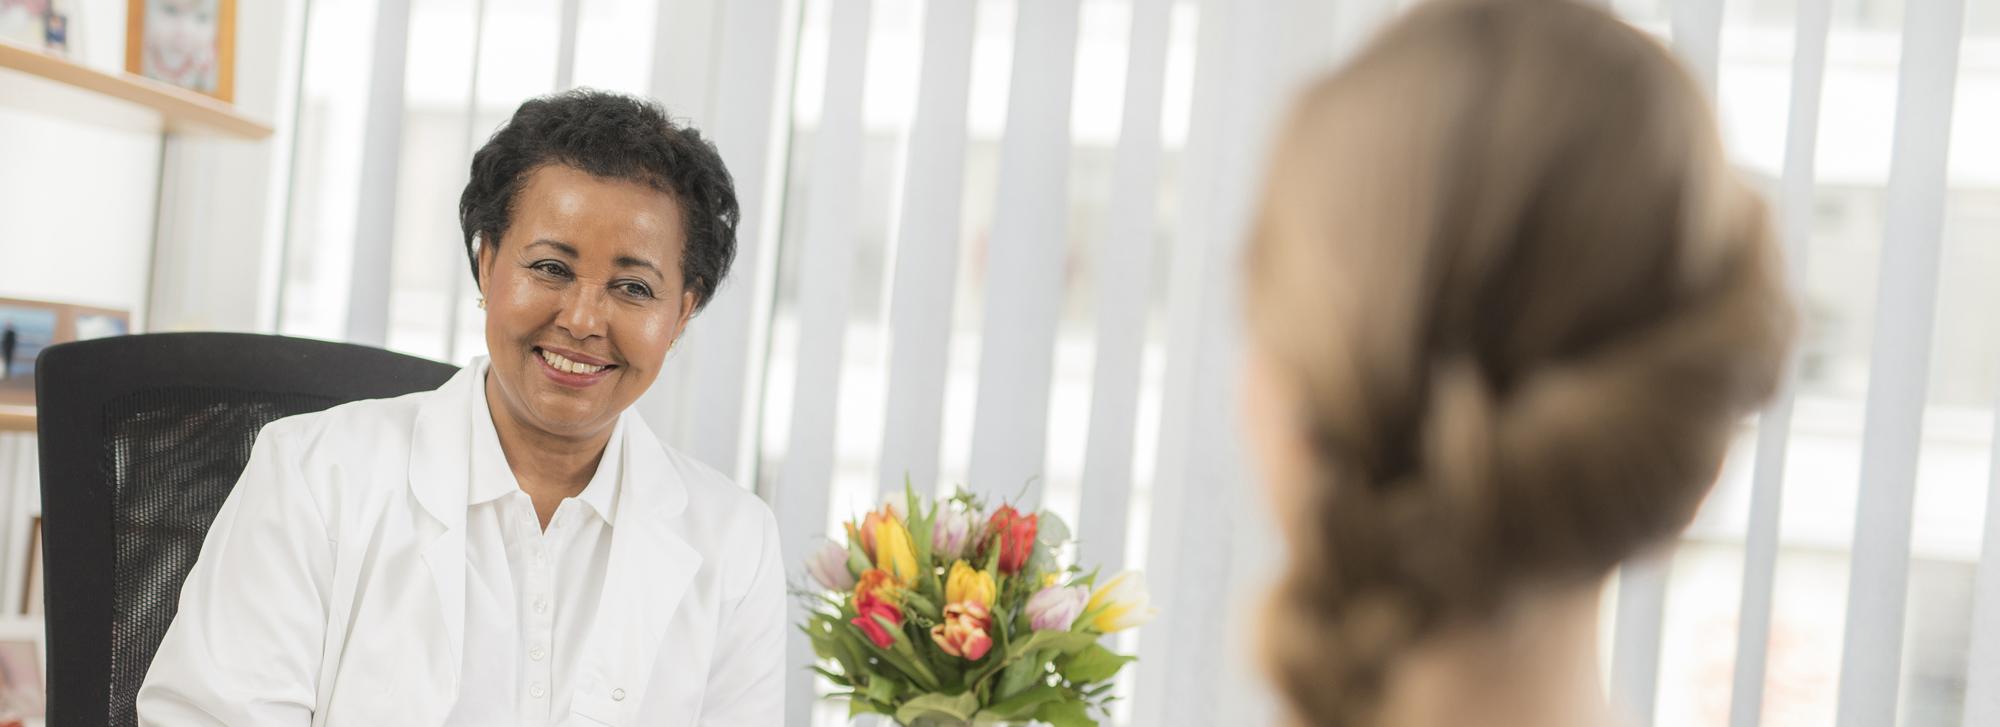 Portrait Ärztin Beratung